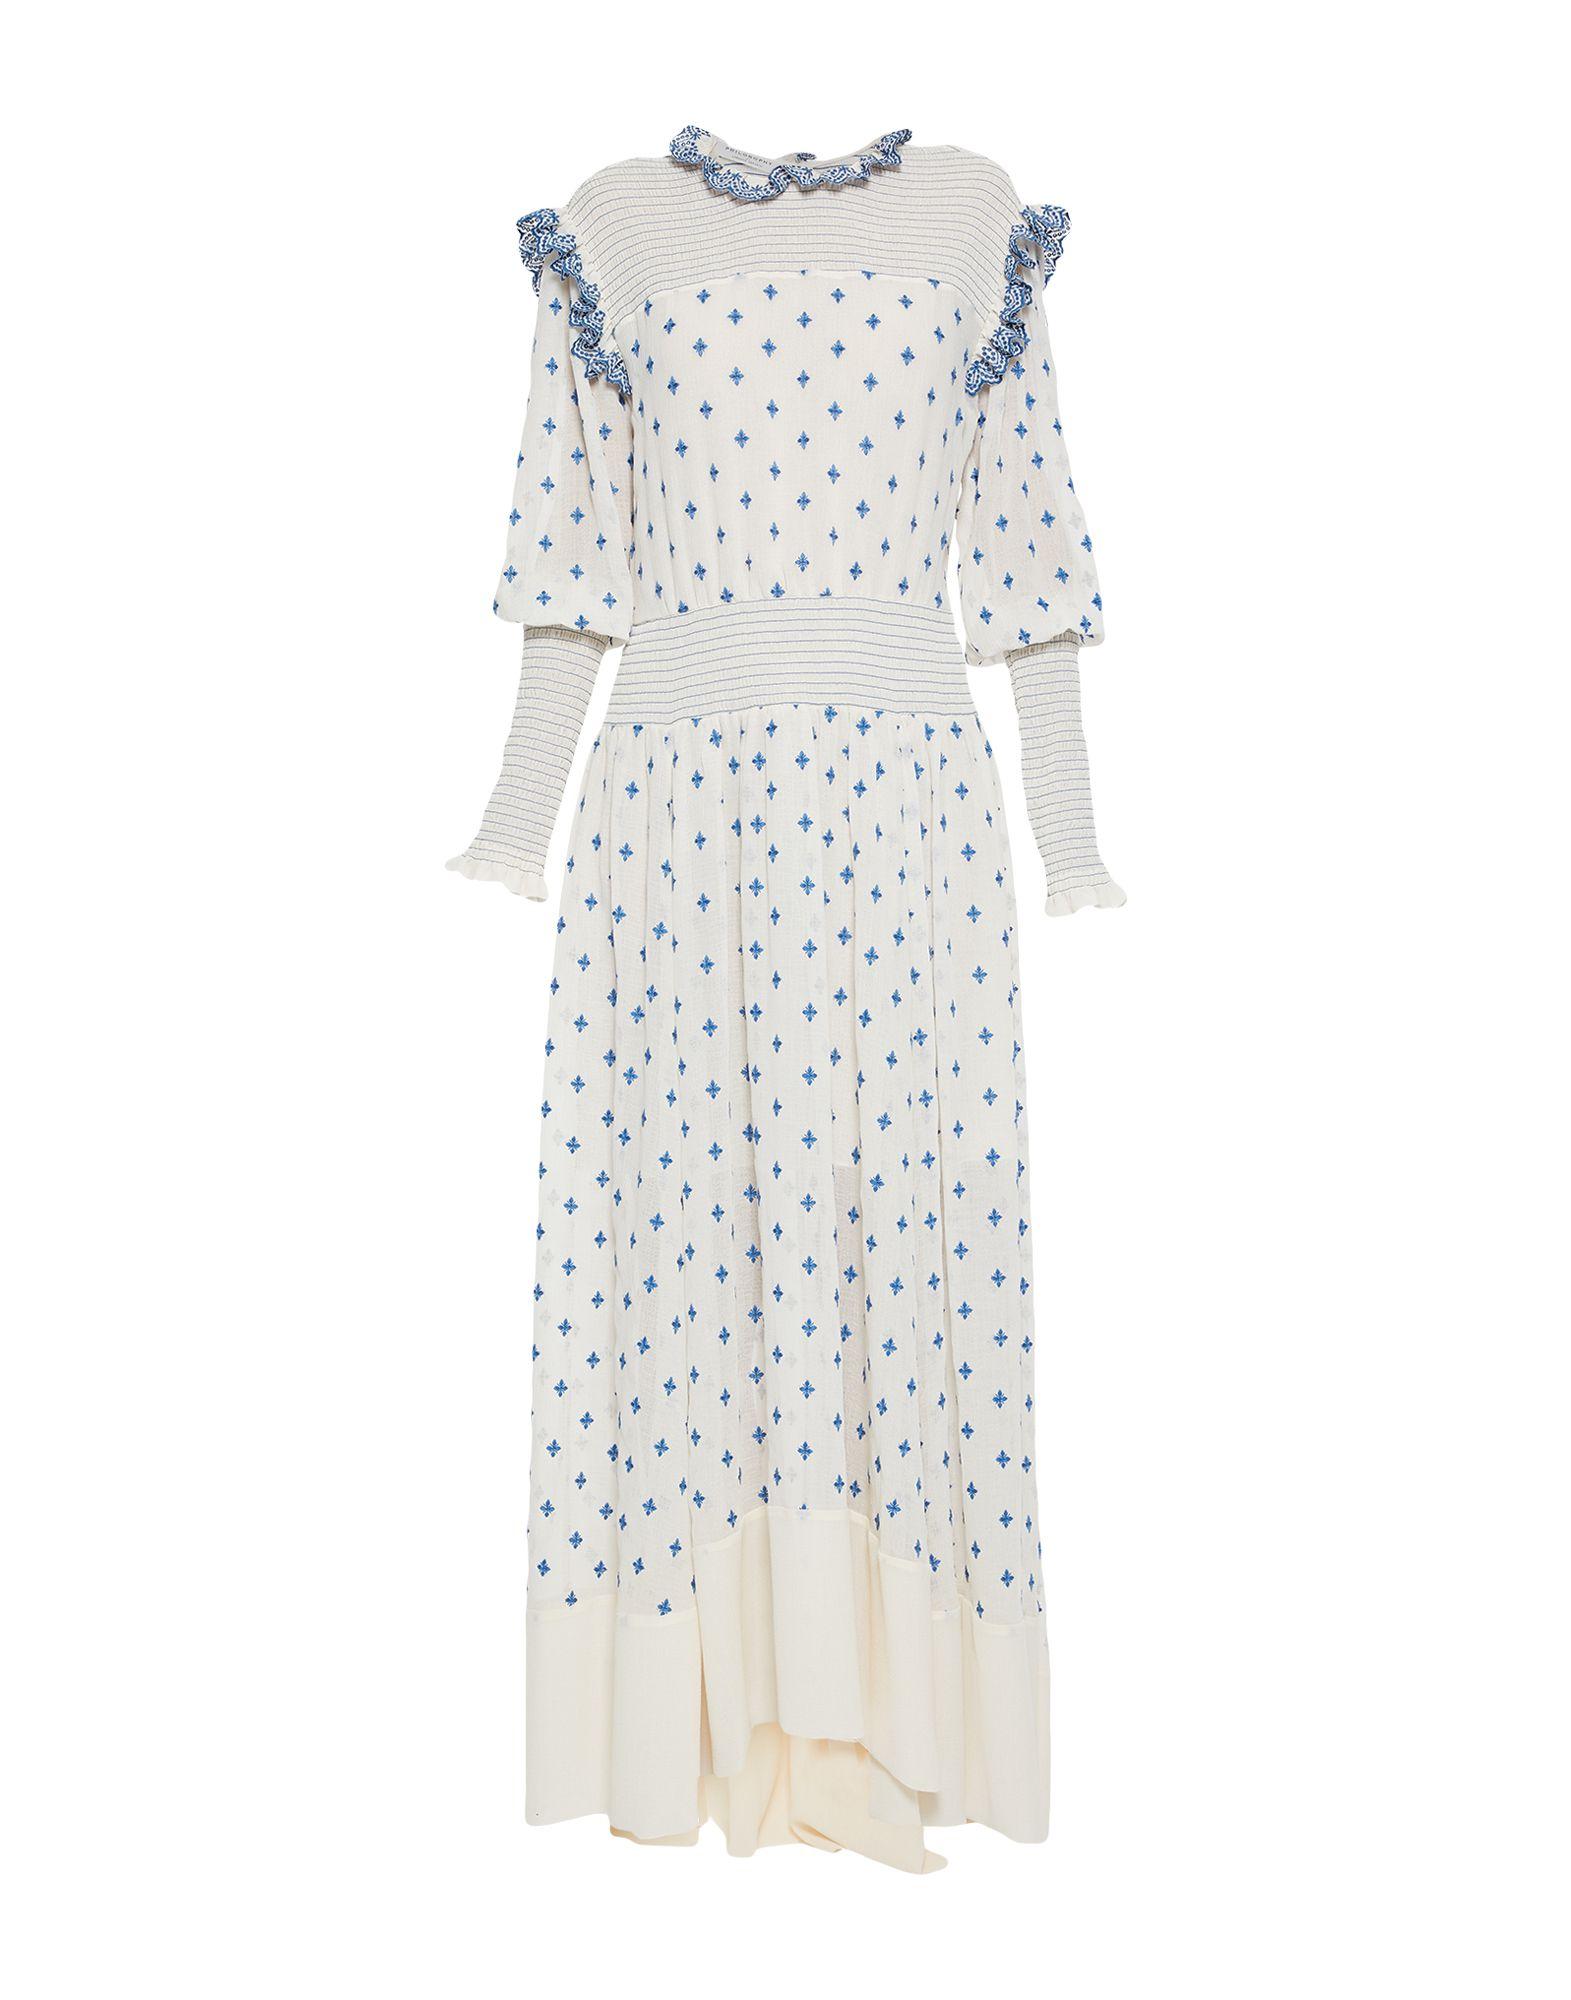 Фото - PHILOSOPHY di LORENZO SERAFINI Длинное платье джемпер philosophy di lorenzo serafini размер 116 кремовый